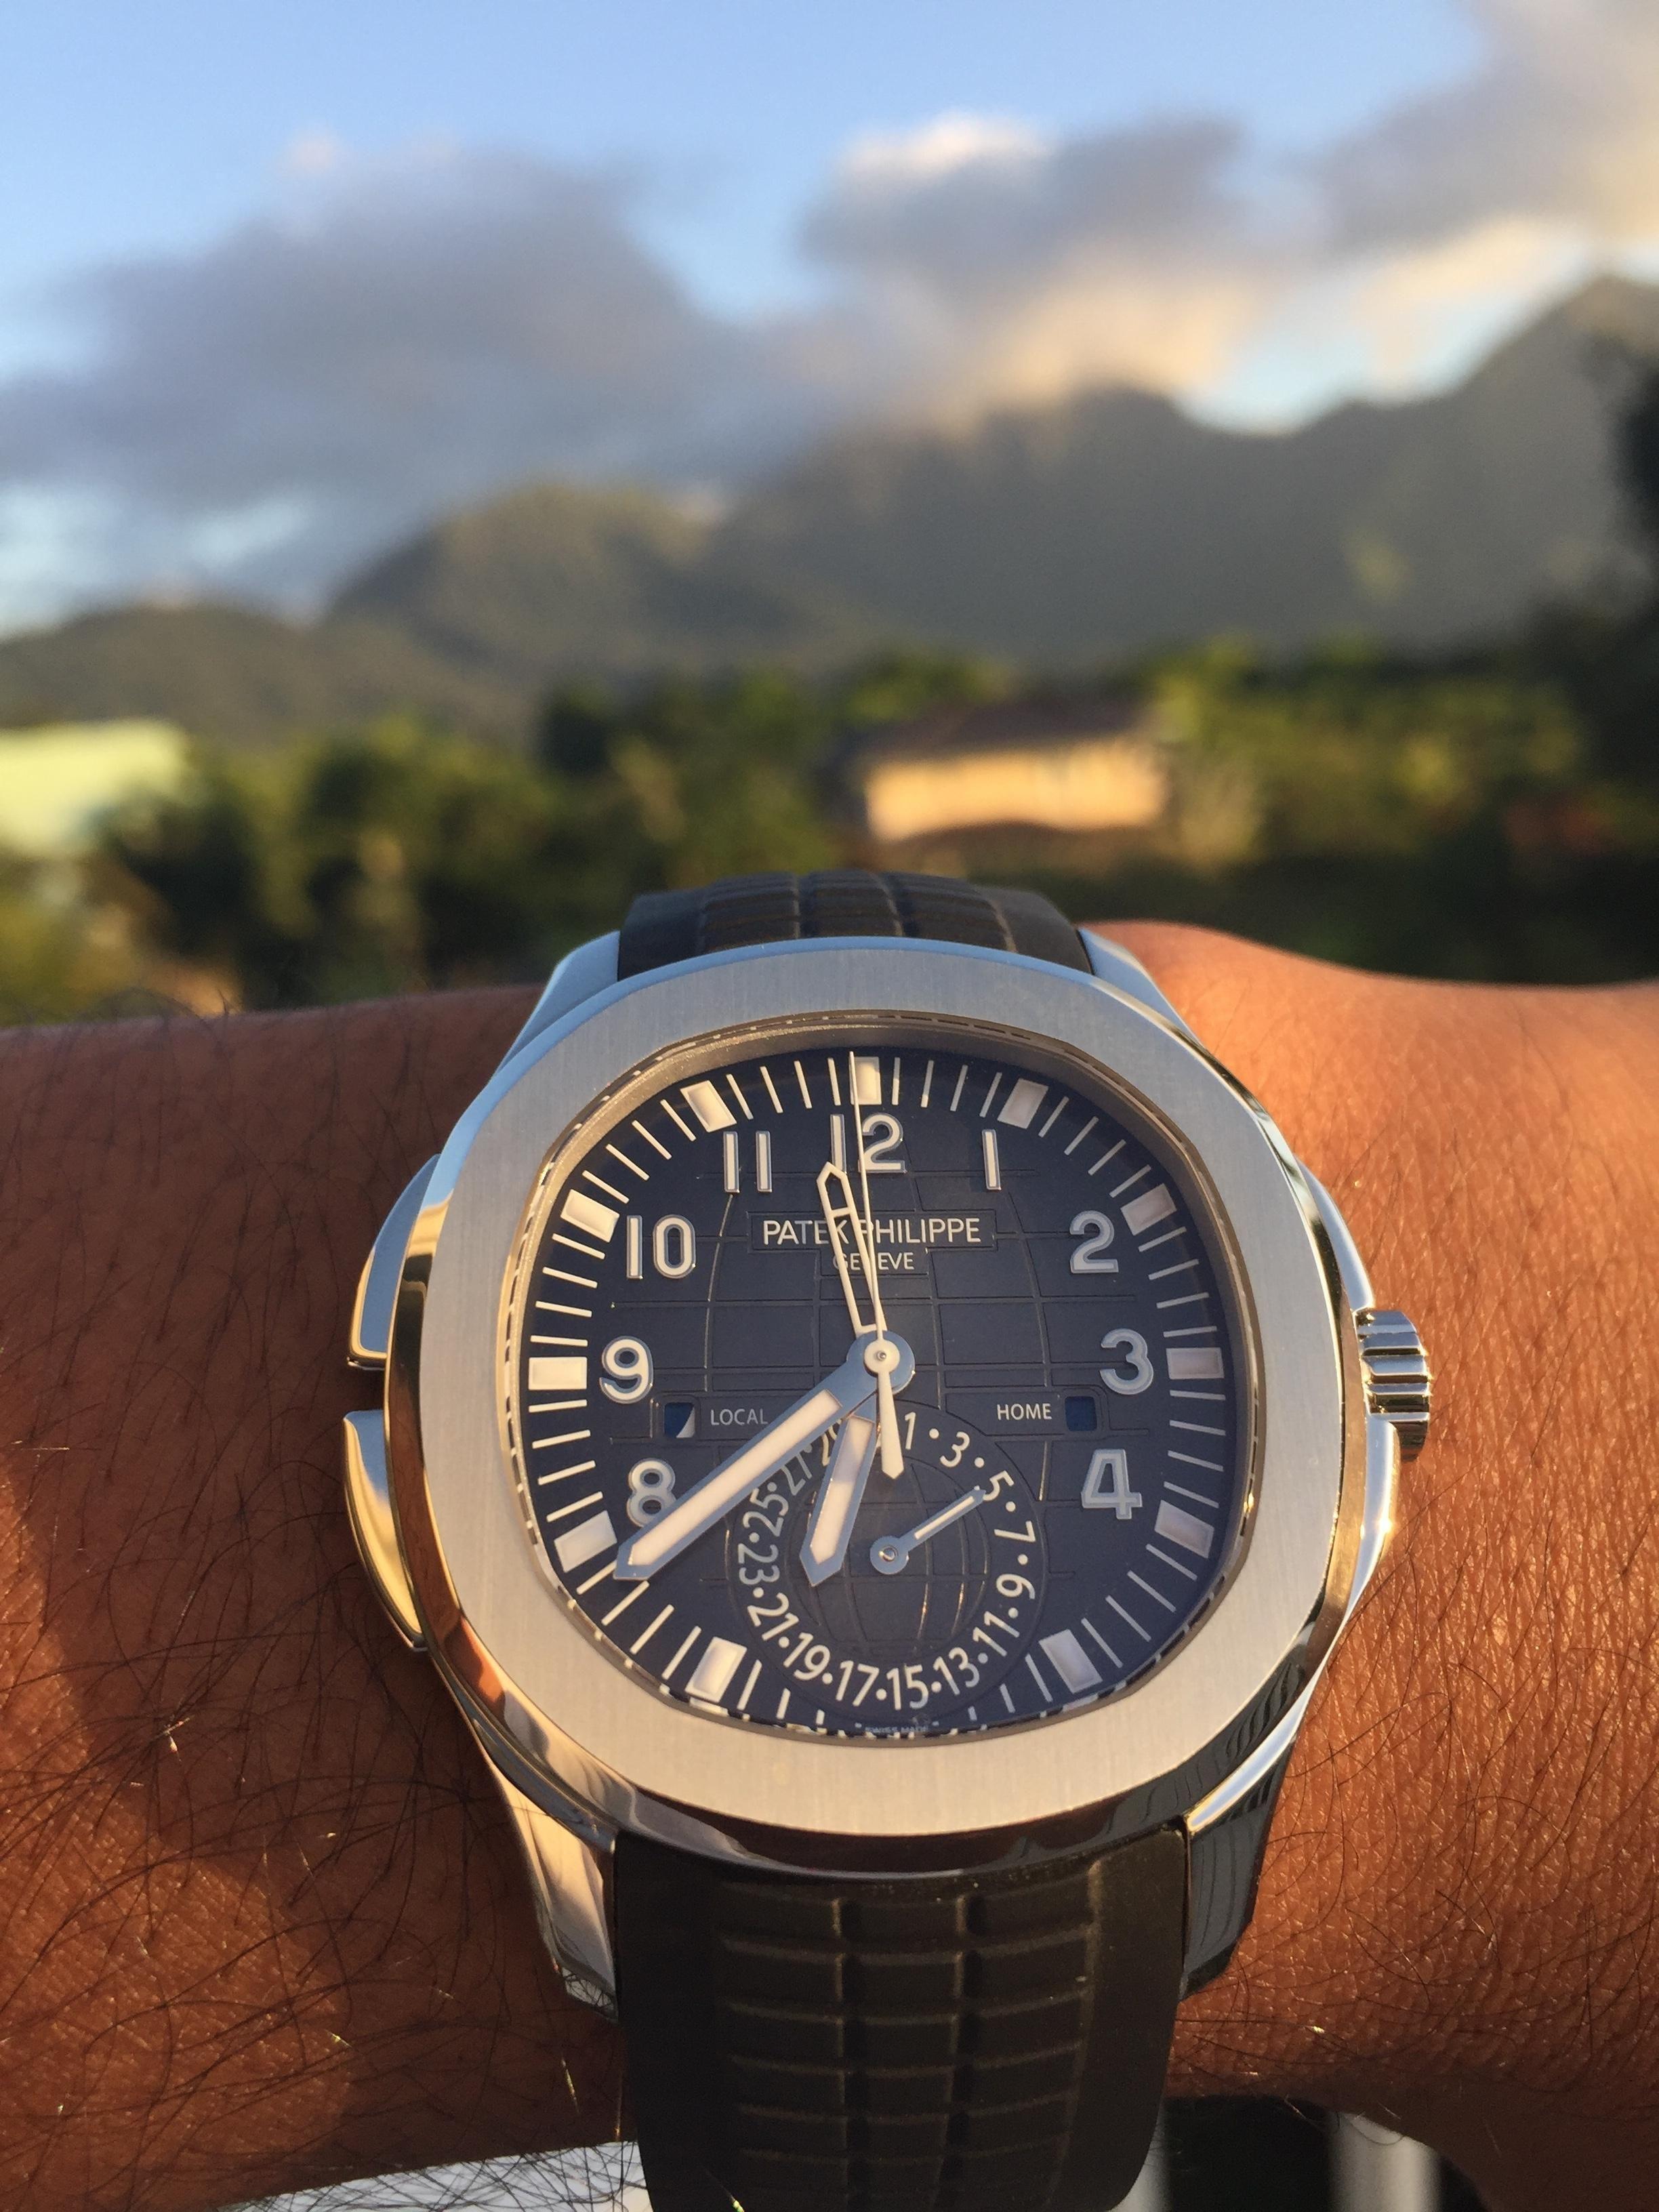 Patek Philippe 5164a Aquanaut Travel Time Watches En 2019 Reloj